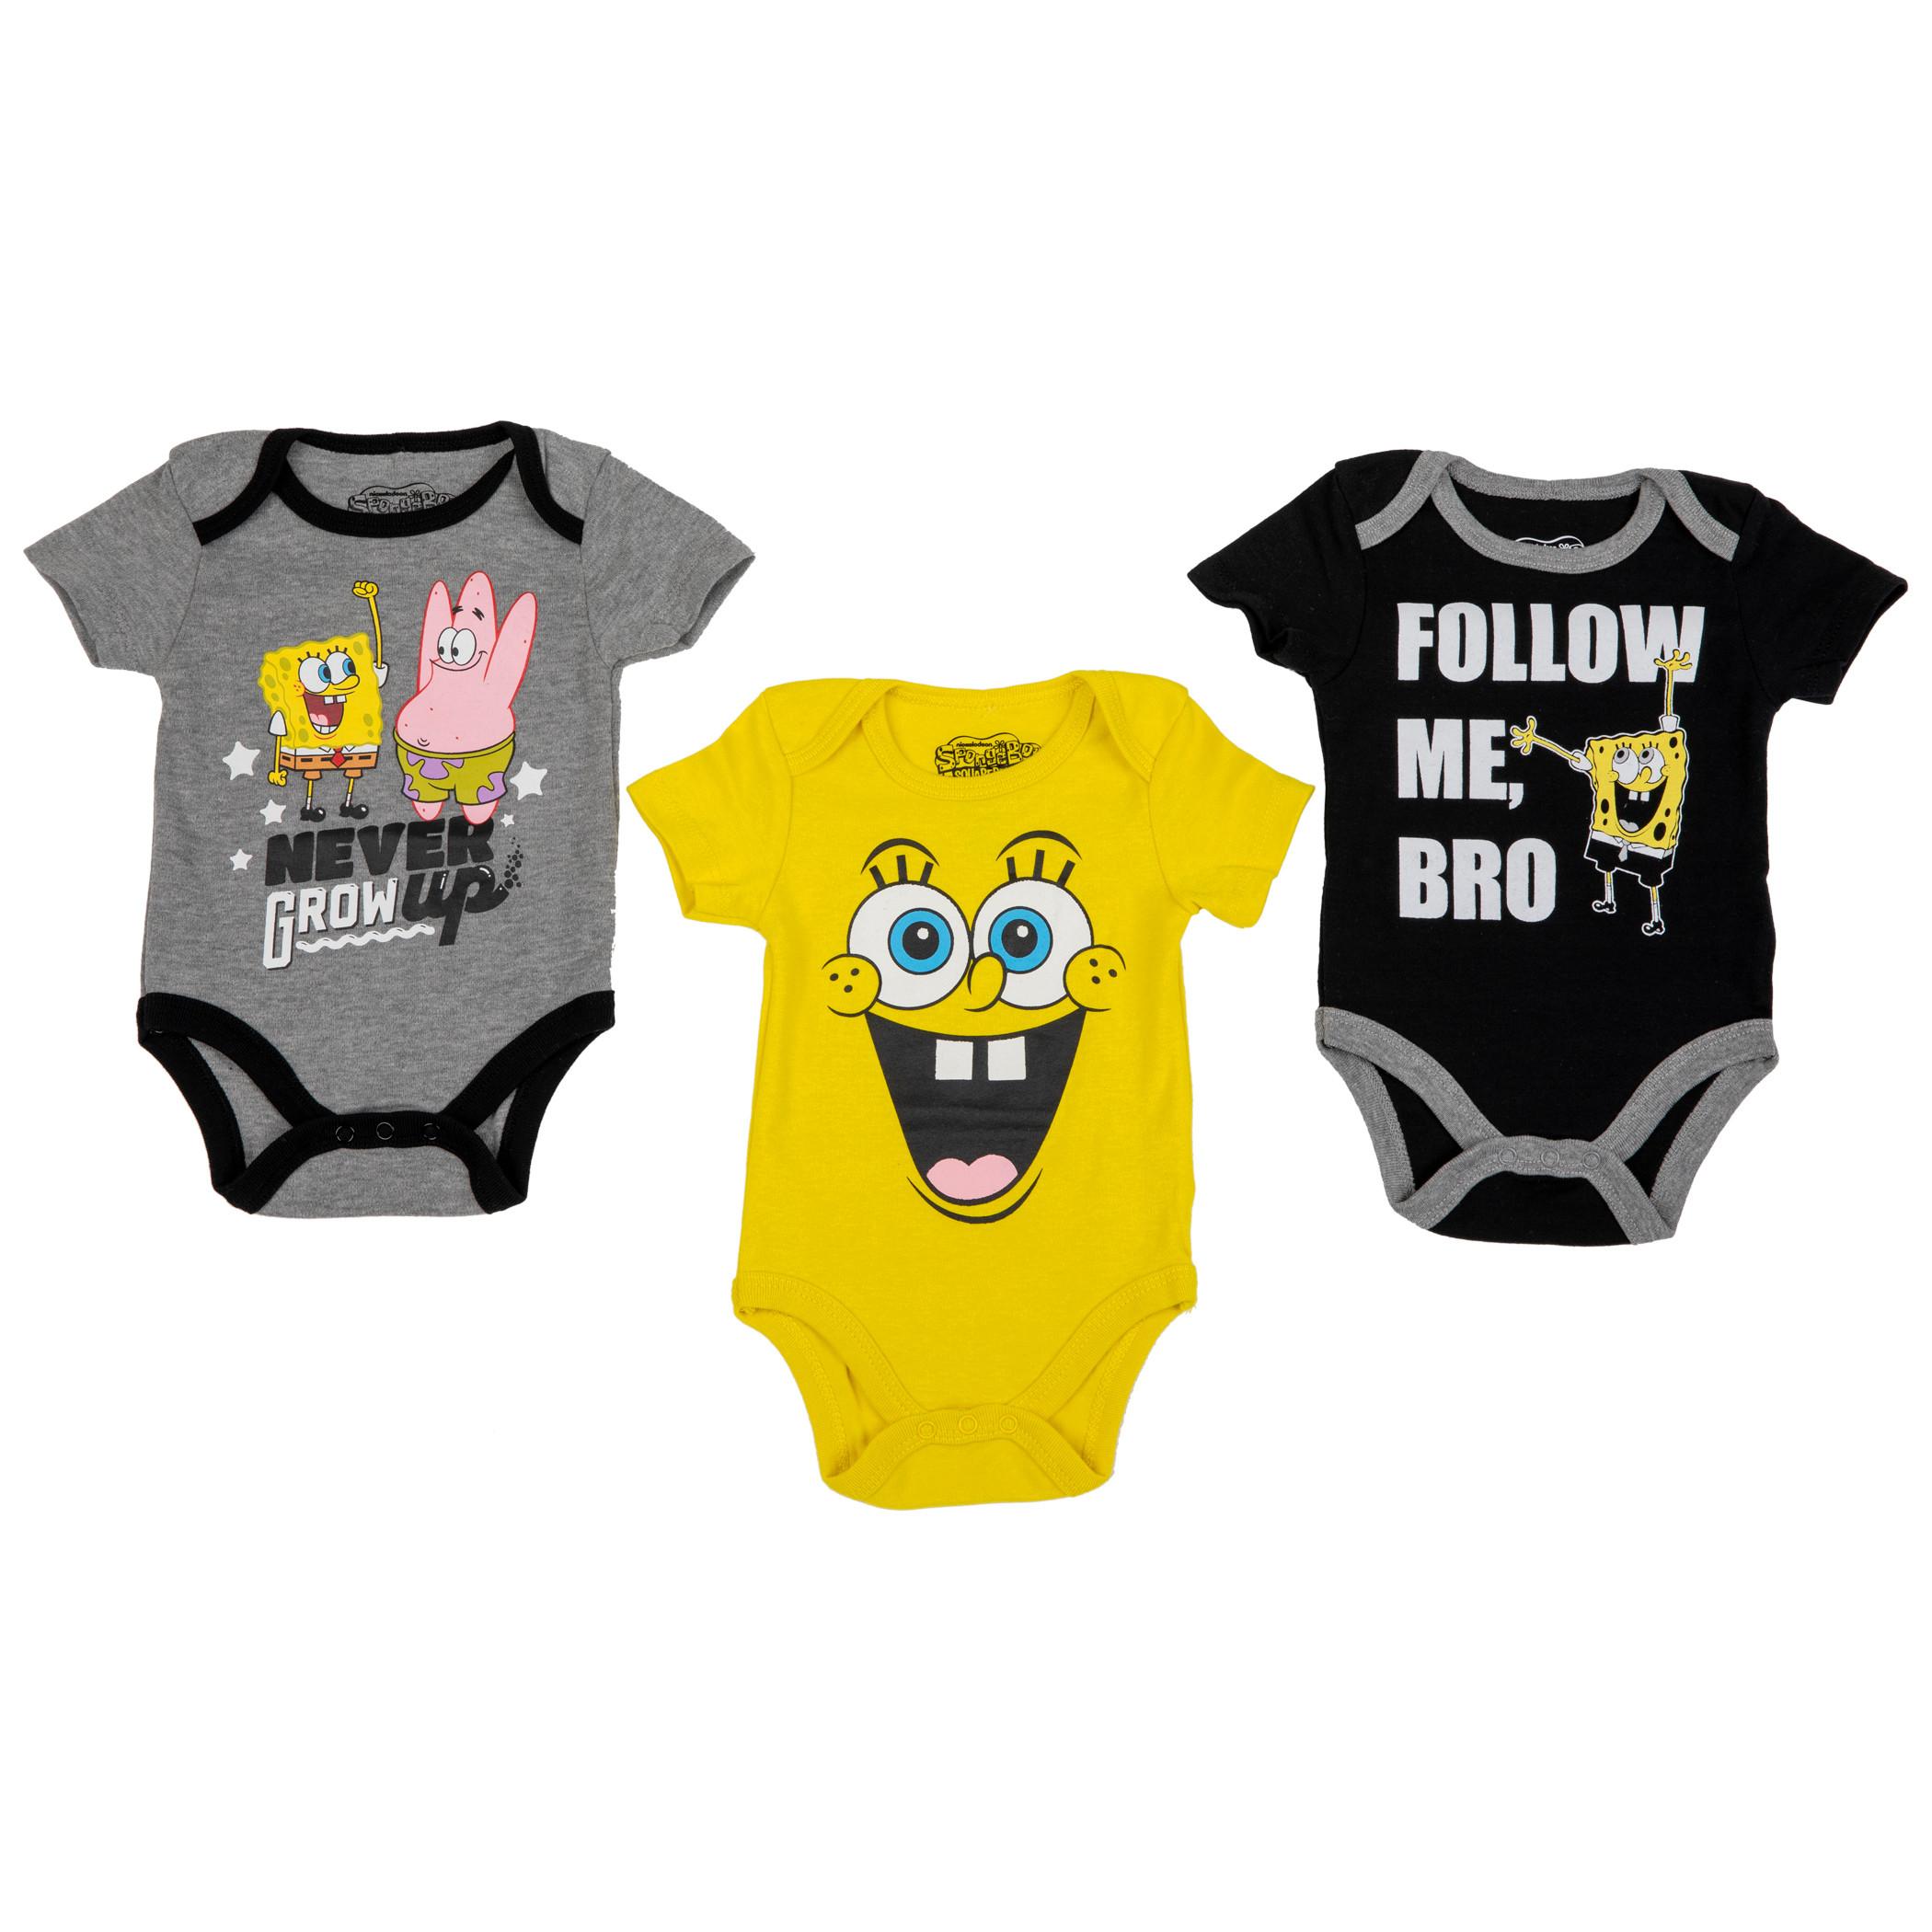 SpongeBob SquarePants Nickelodeon Characters 3 Pack Snap Suits